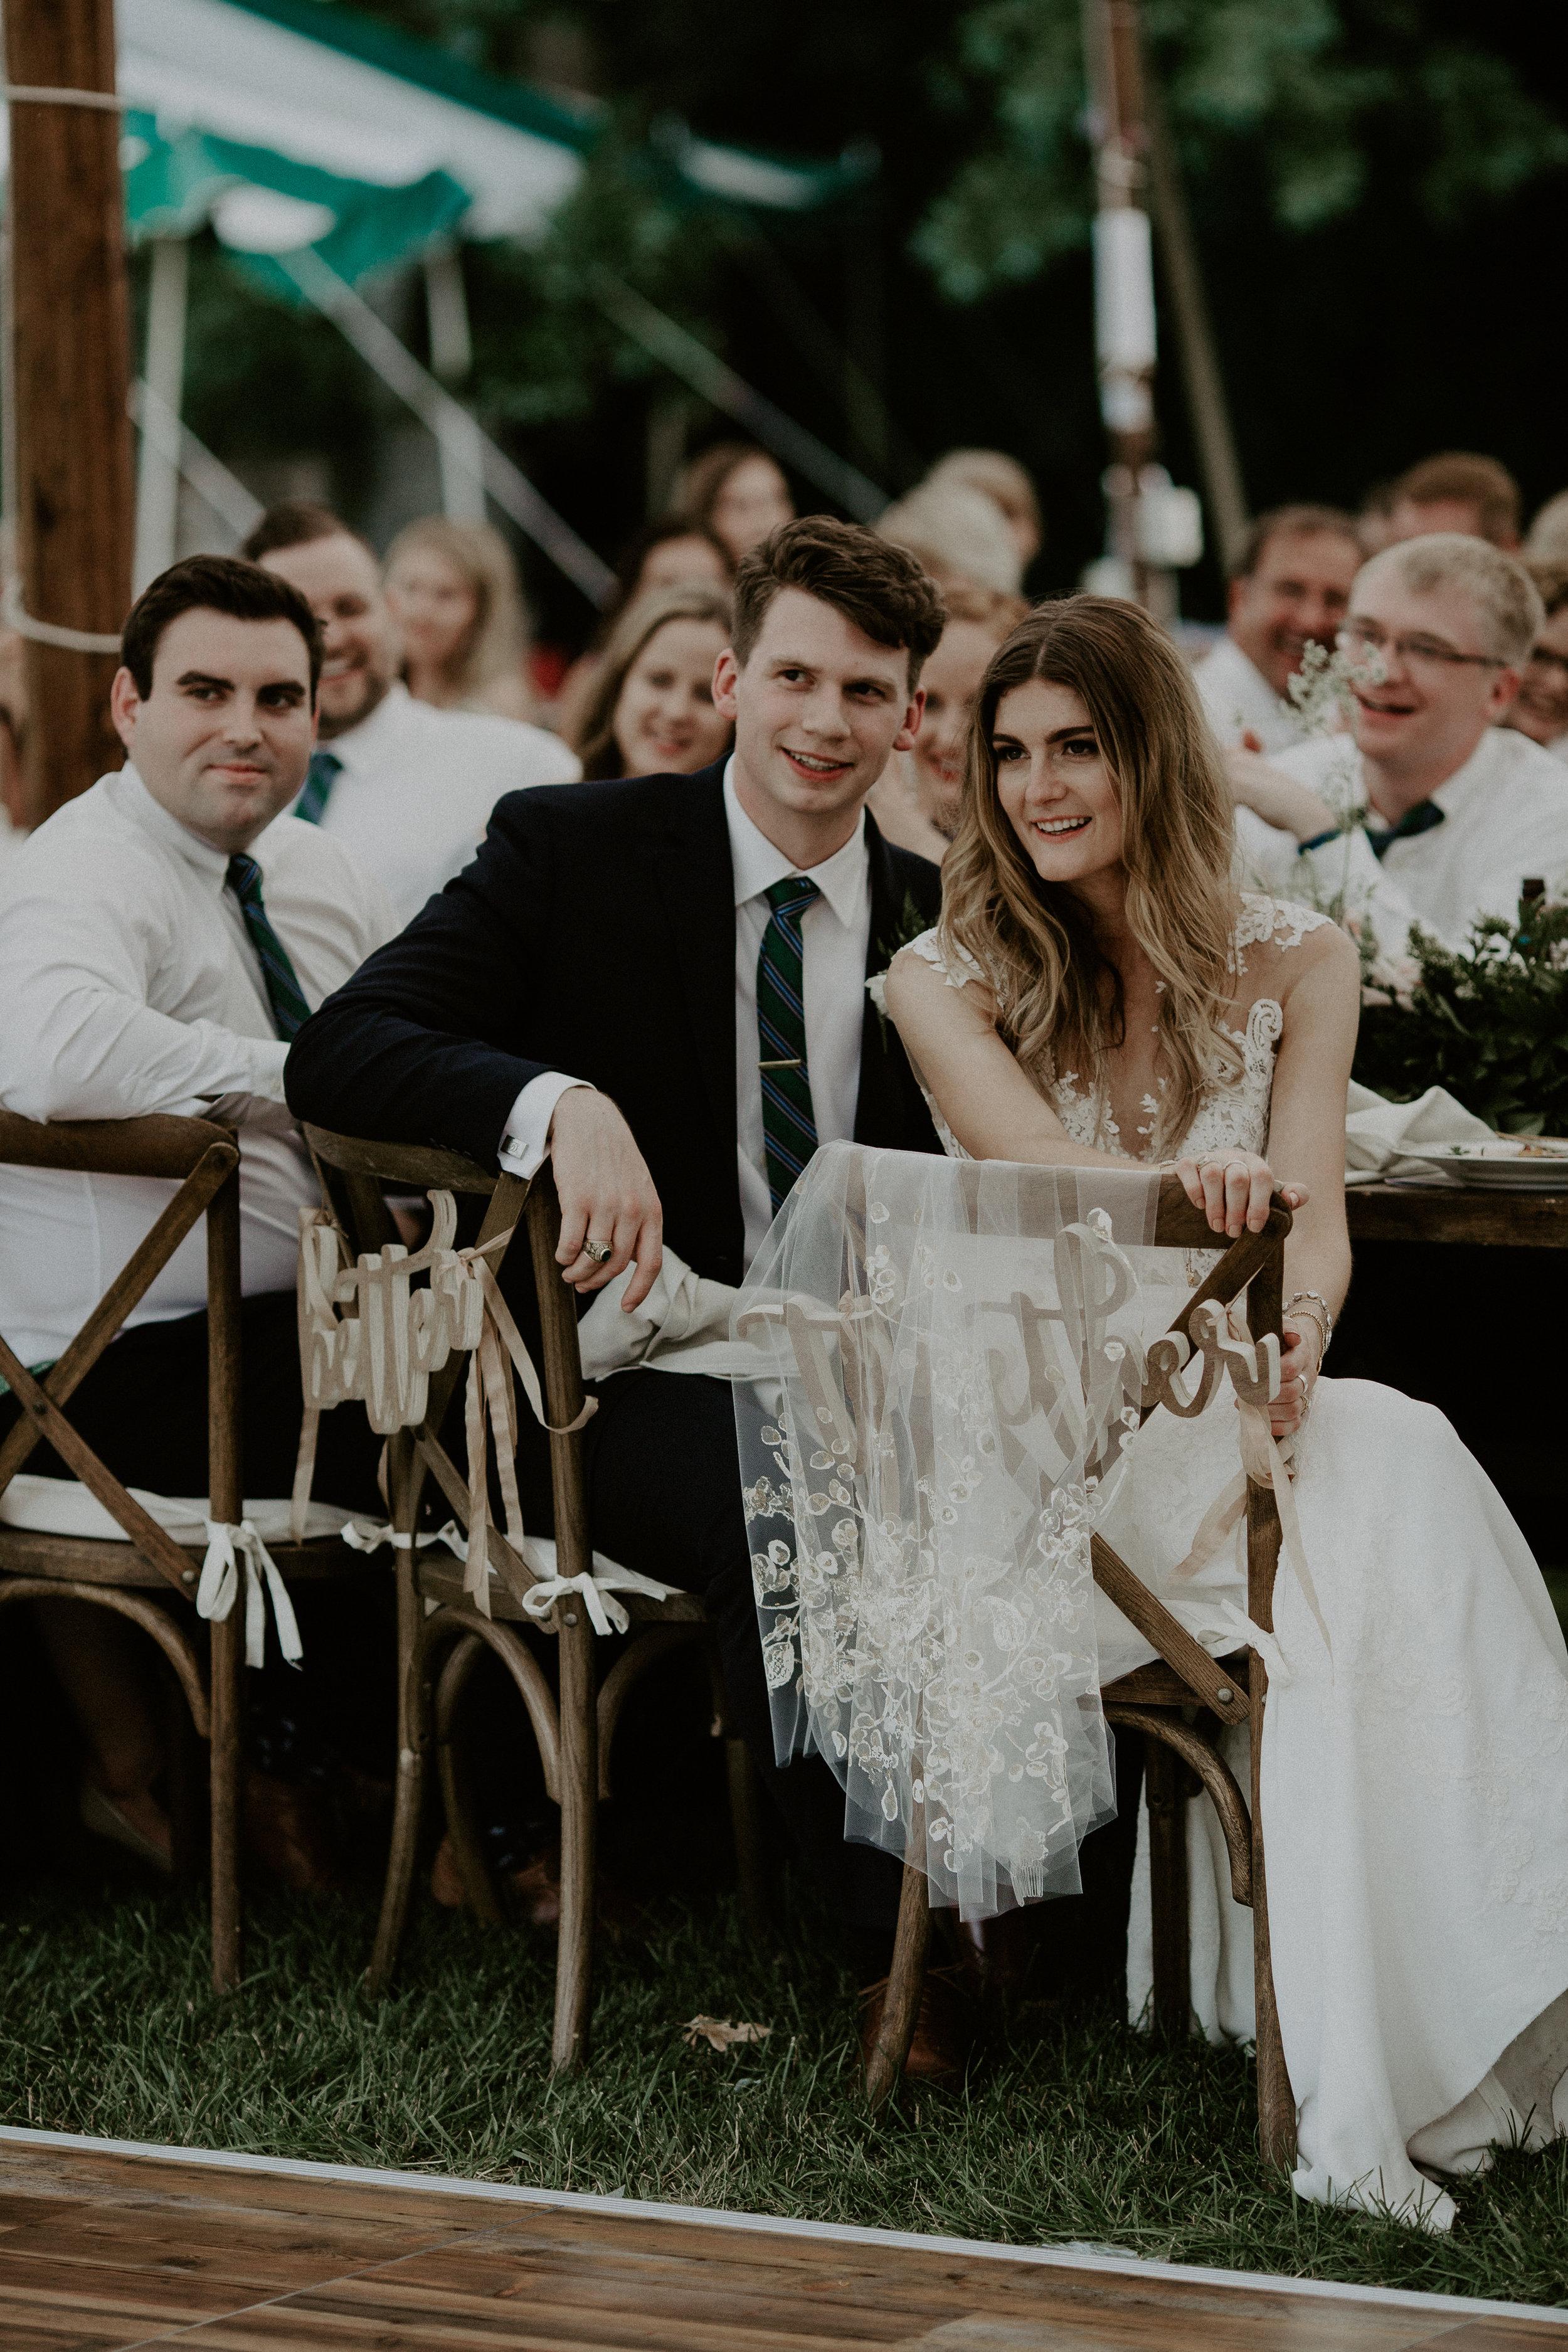 Mariemont_Chapel_Cincinnati_Wedding_Hannah_Nick-EDIT-634.JPG